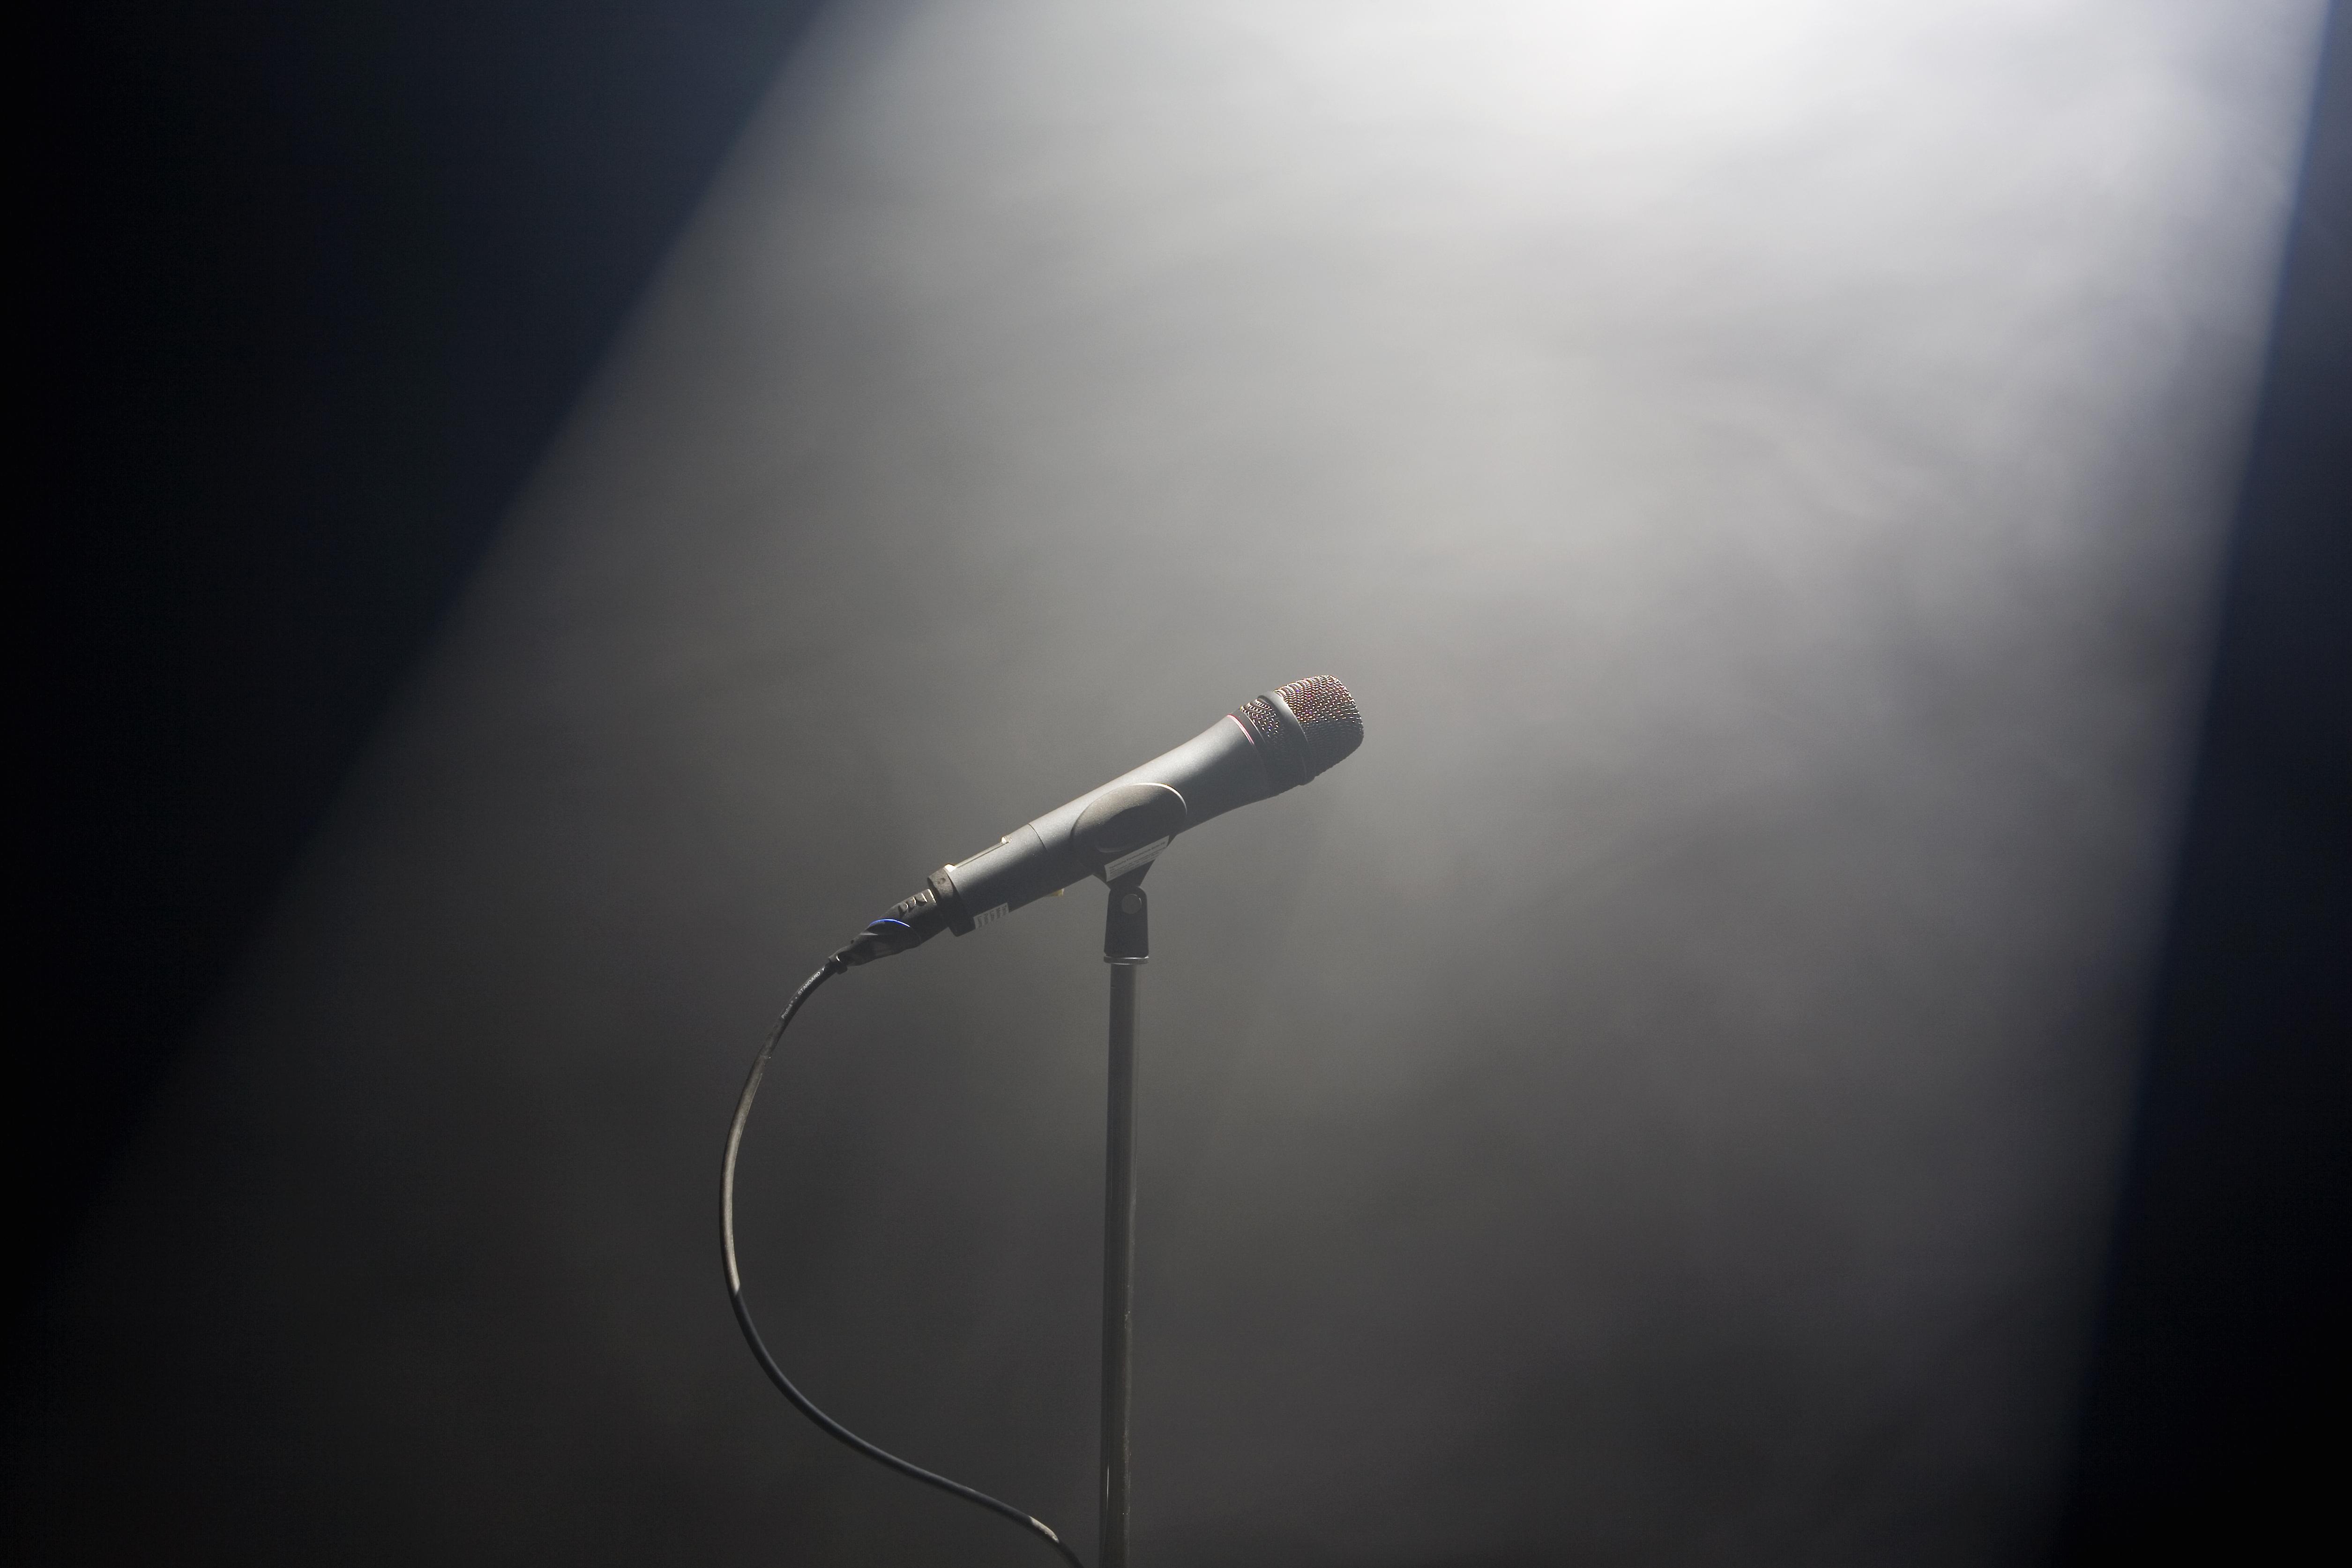 A spot lit microphone stand